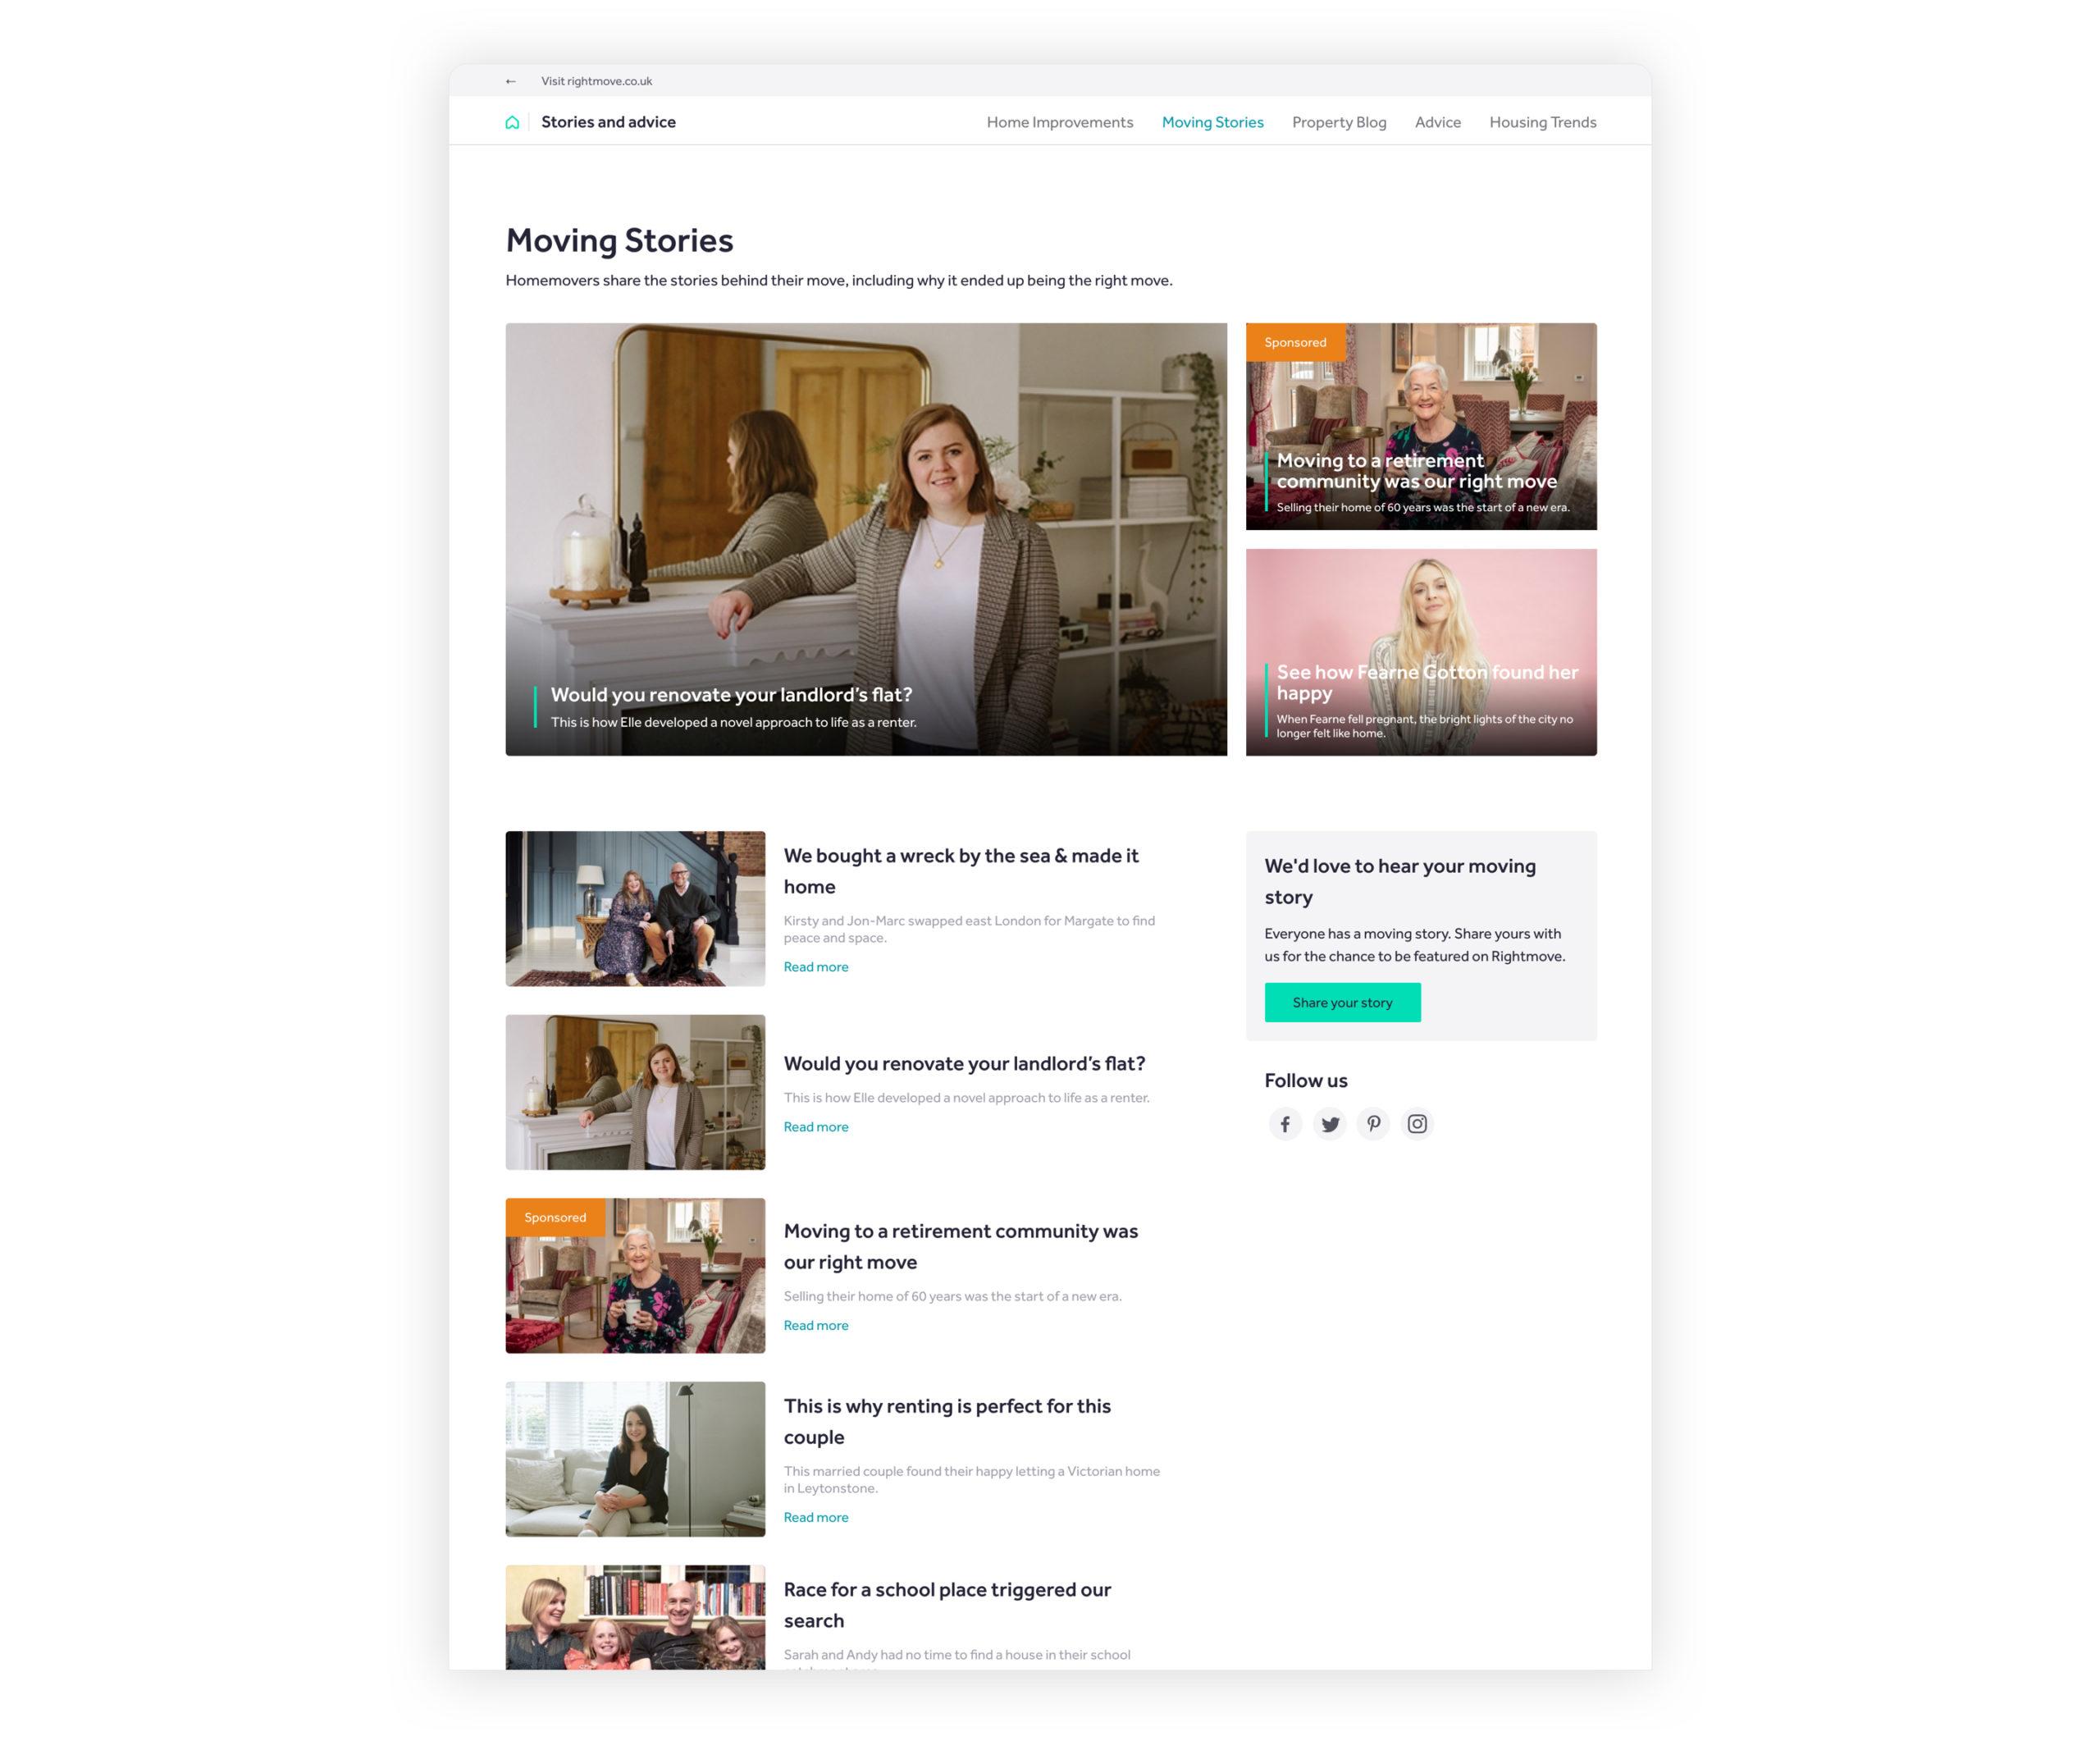 rightmove moving stories homepage screenshot